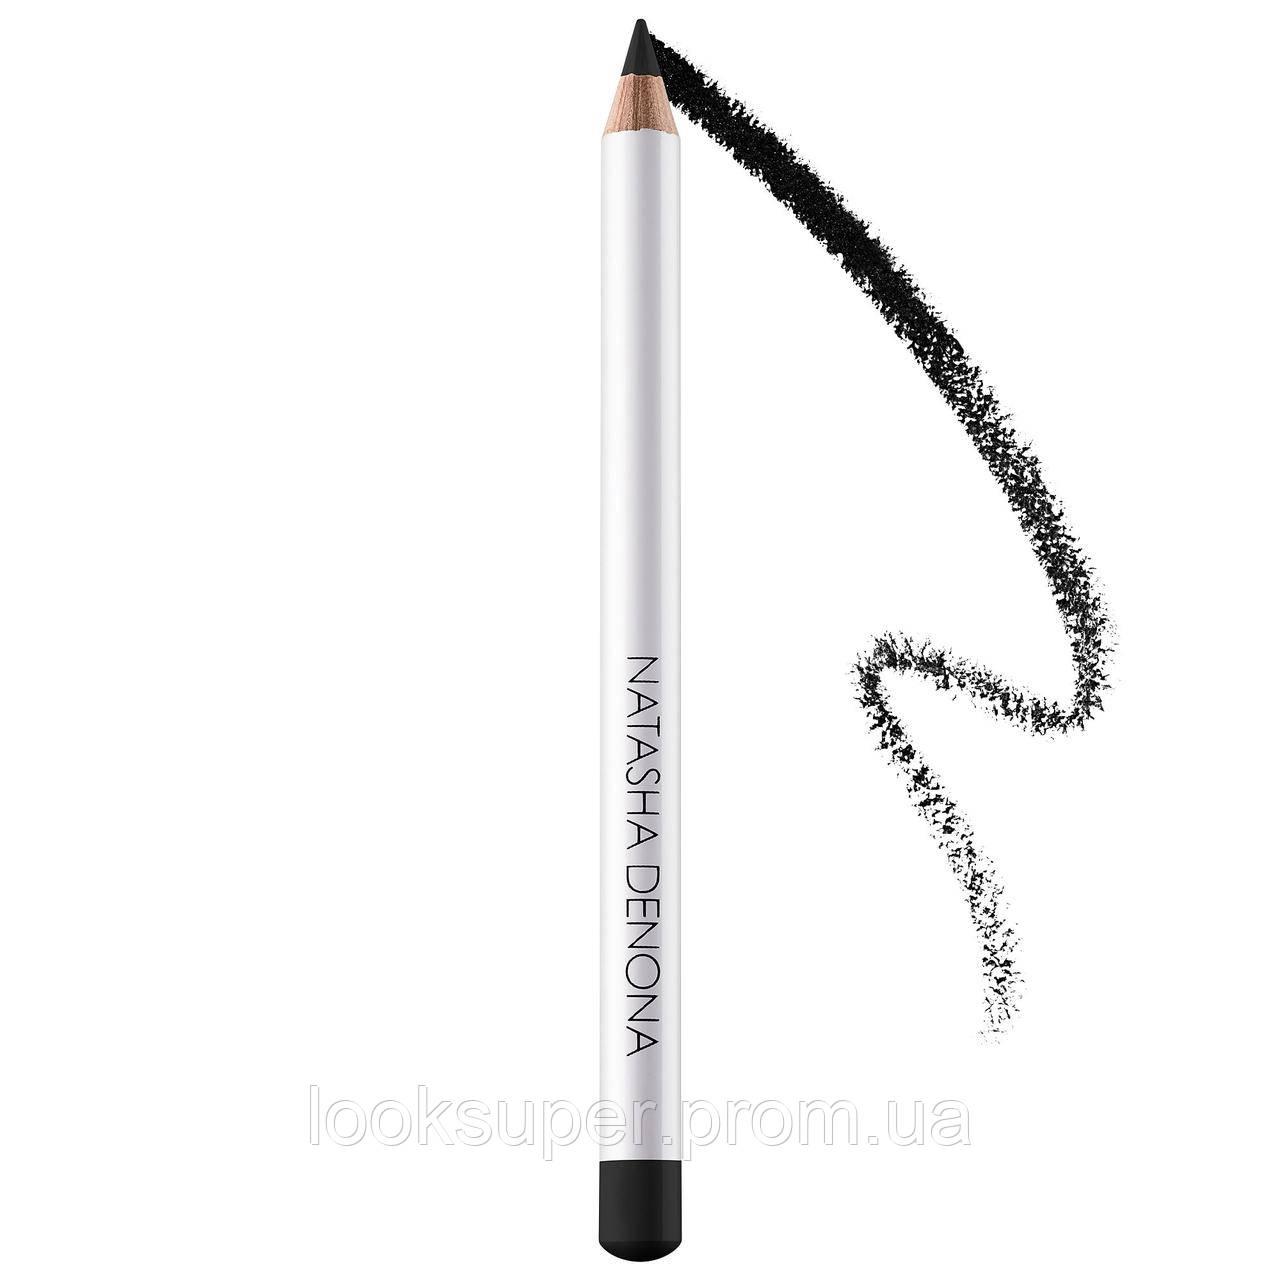 Карандаш для подводки глаз NATASHA DENONA  Eye Liner Pencil  Black